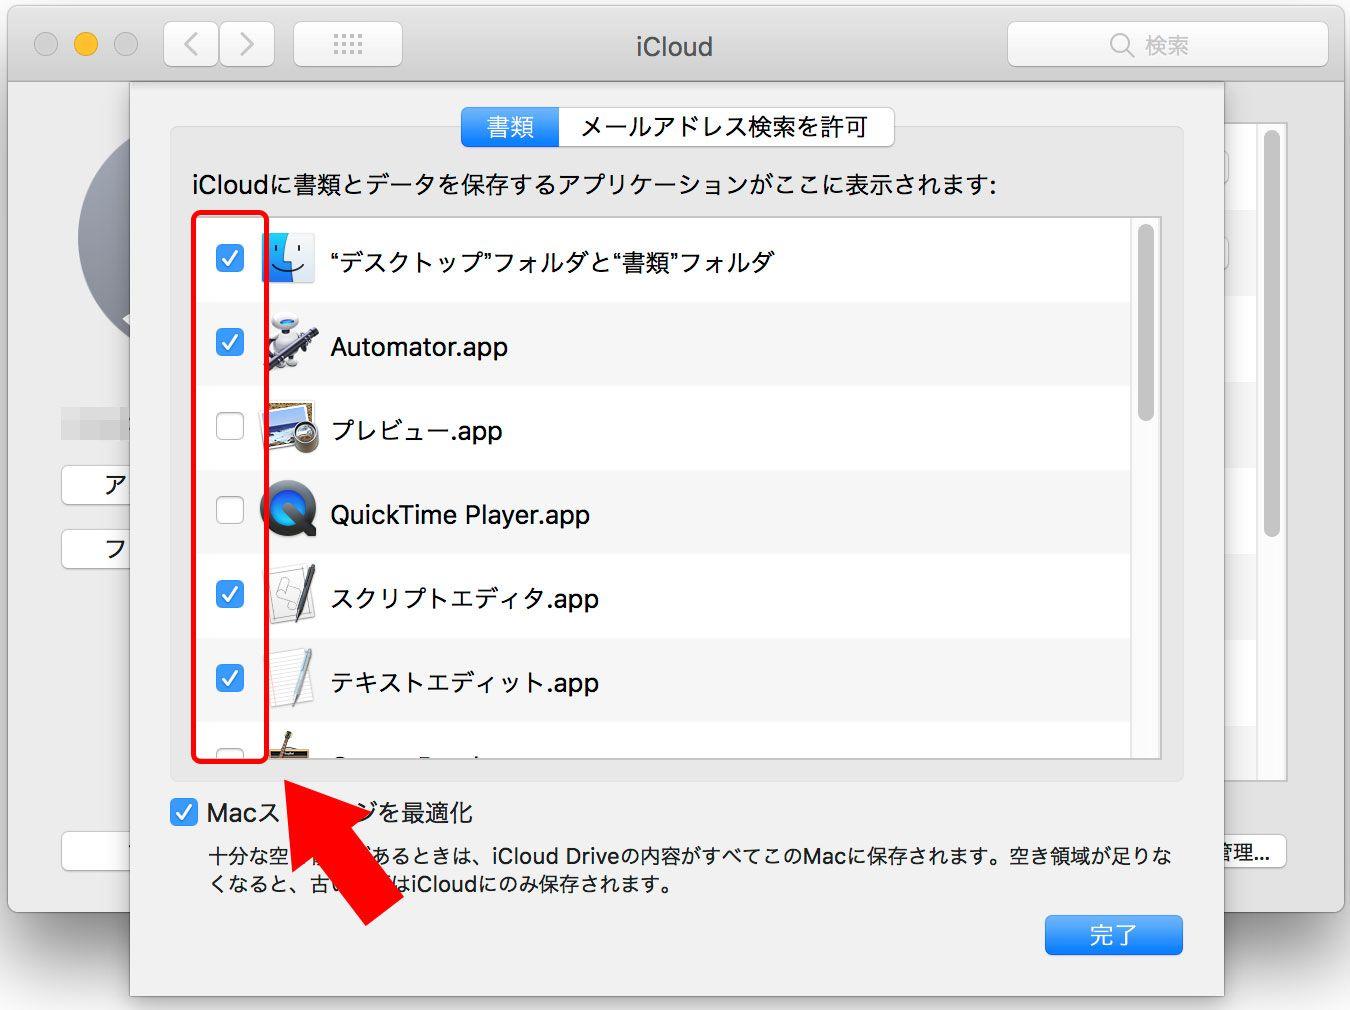 MacのiCloud Drive設定画面